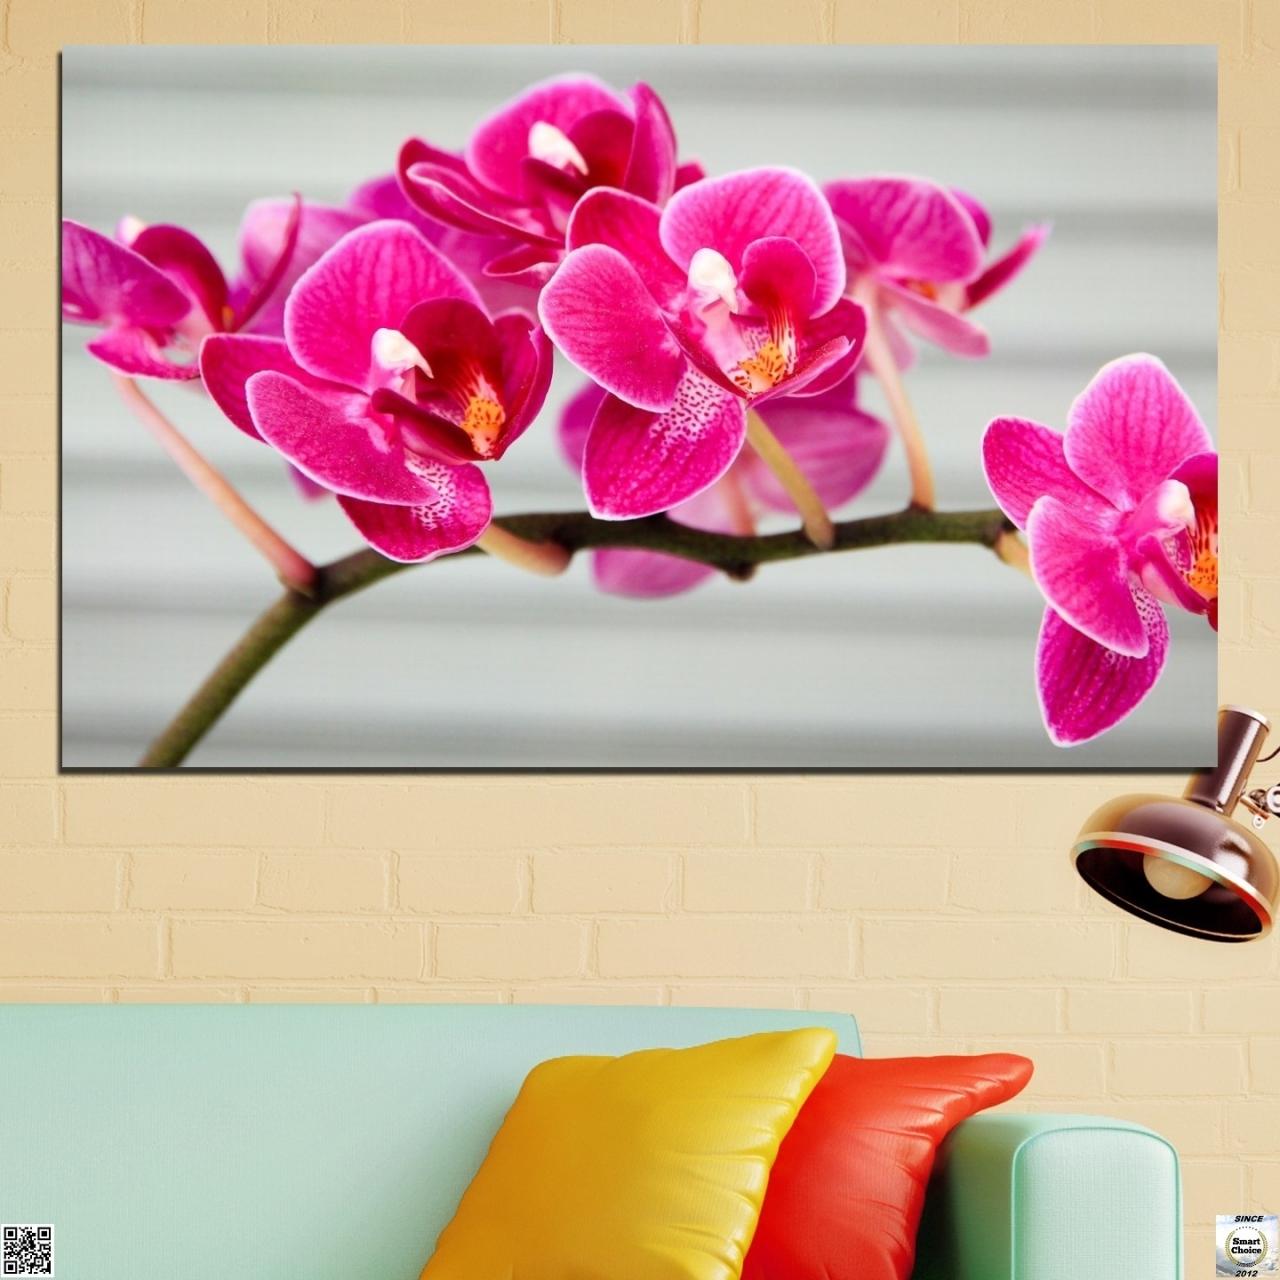 decorativno-pano-za-stena-ot-1-chast-s-klonche-rozova-orhidea-hd-702-1.jpg